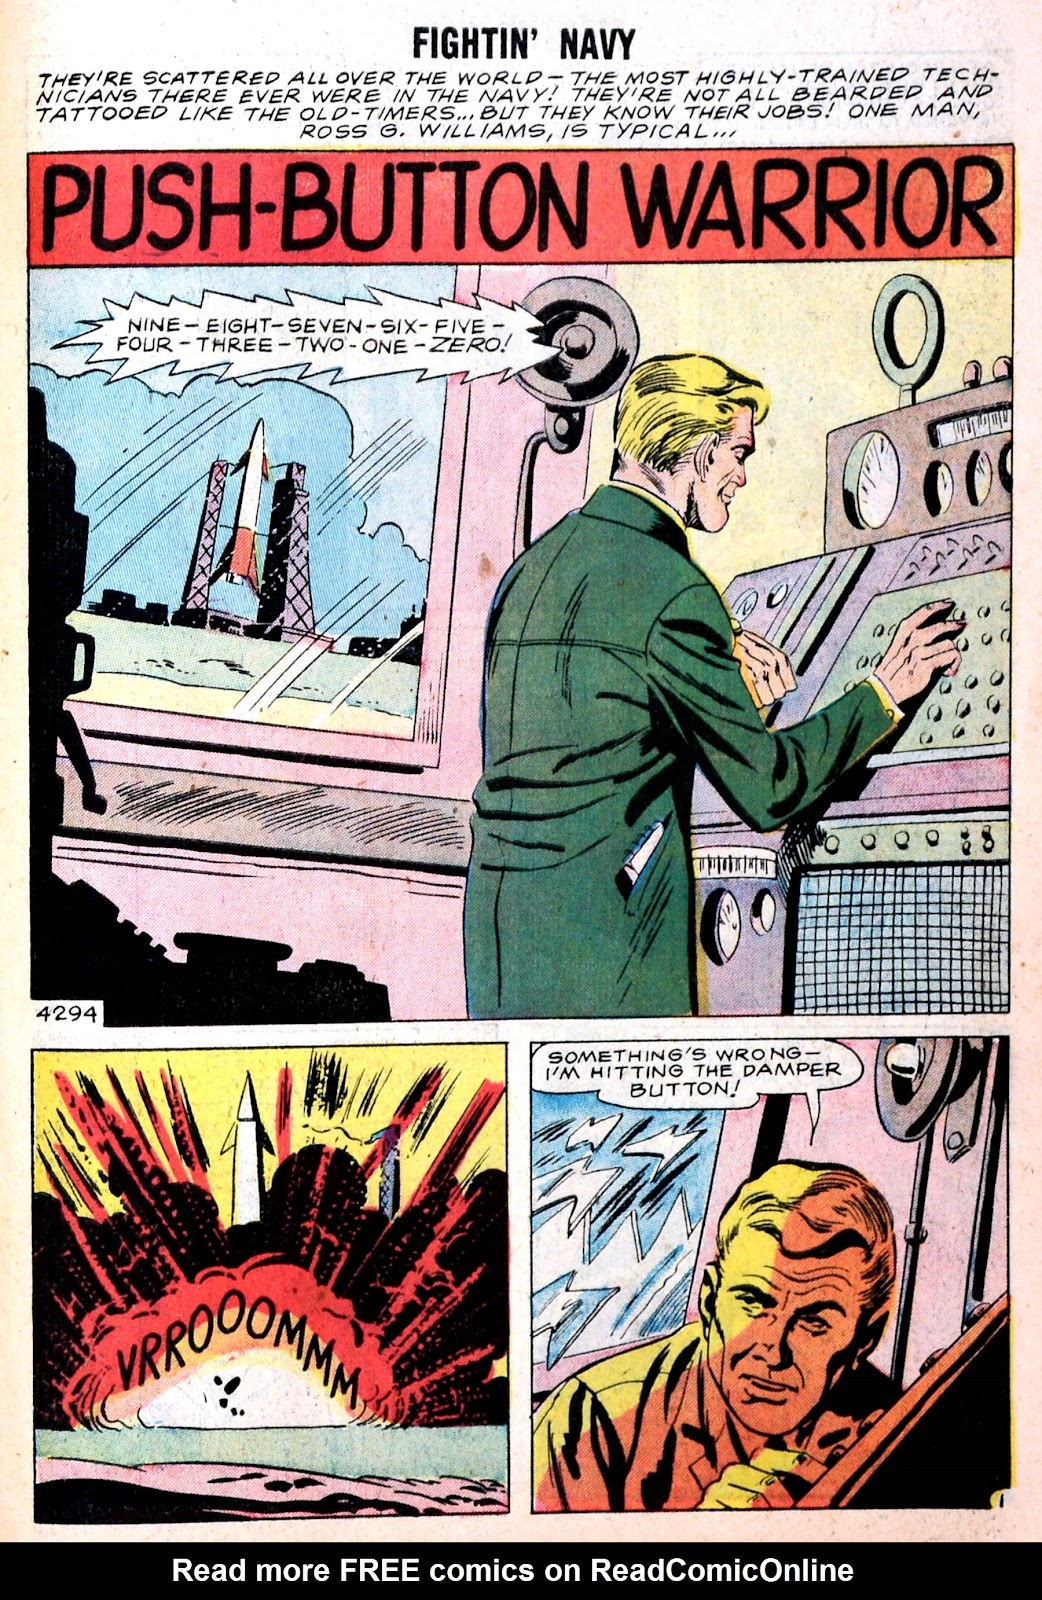 Read online Fightin' Navy comic -  Issue #85 - 27